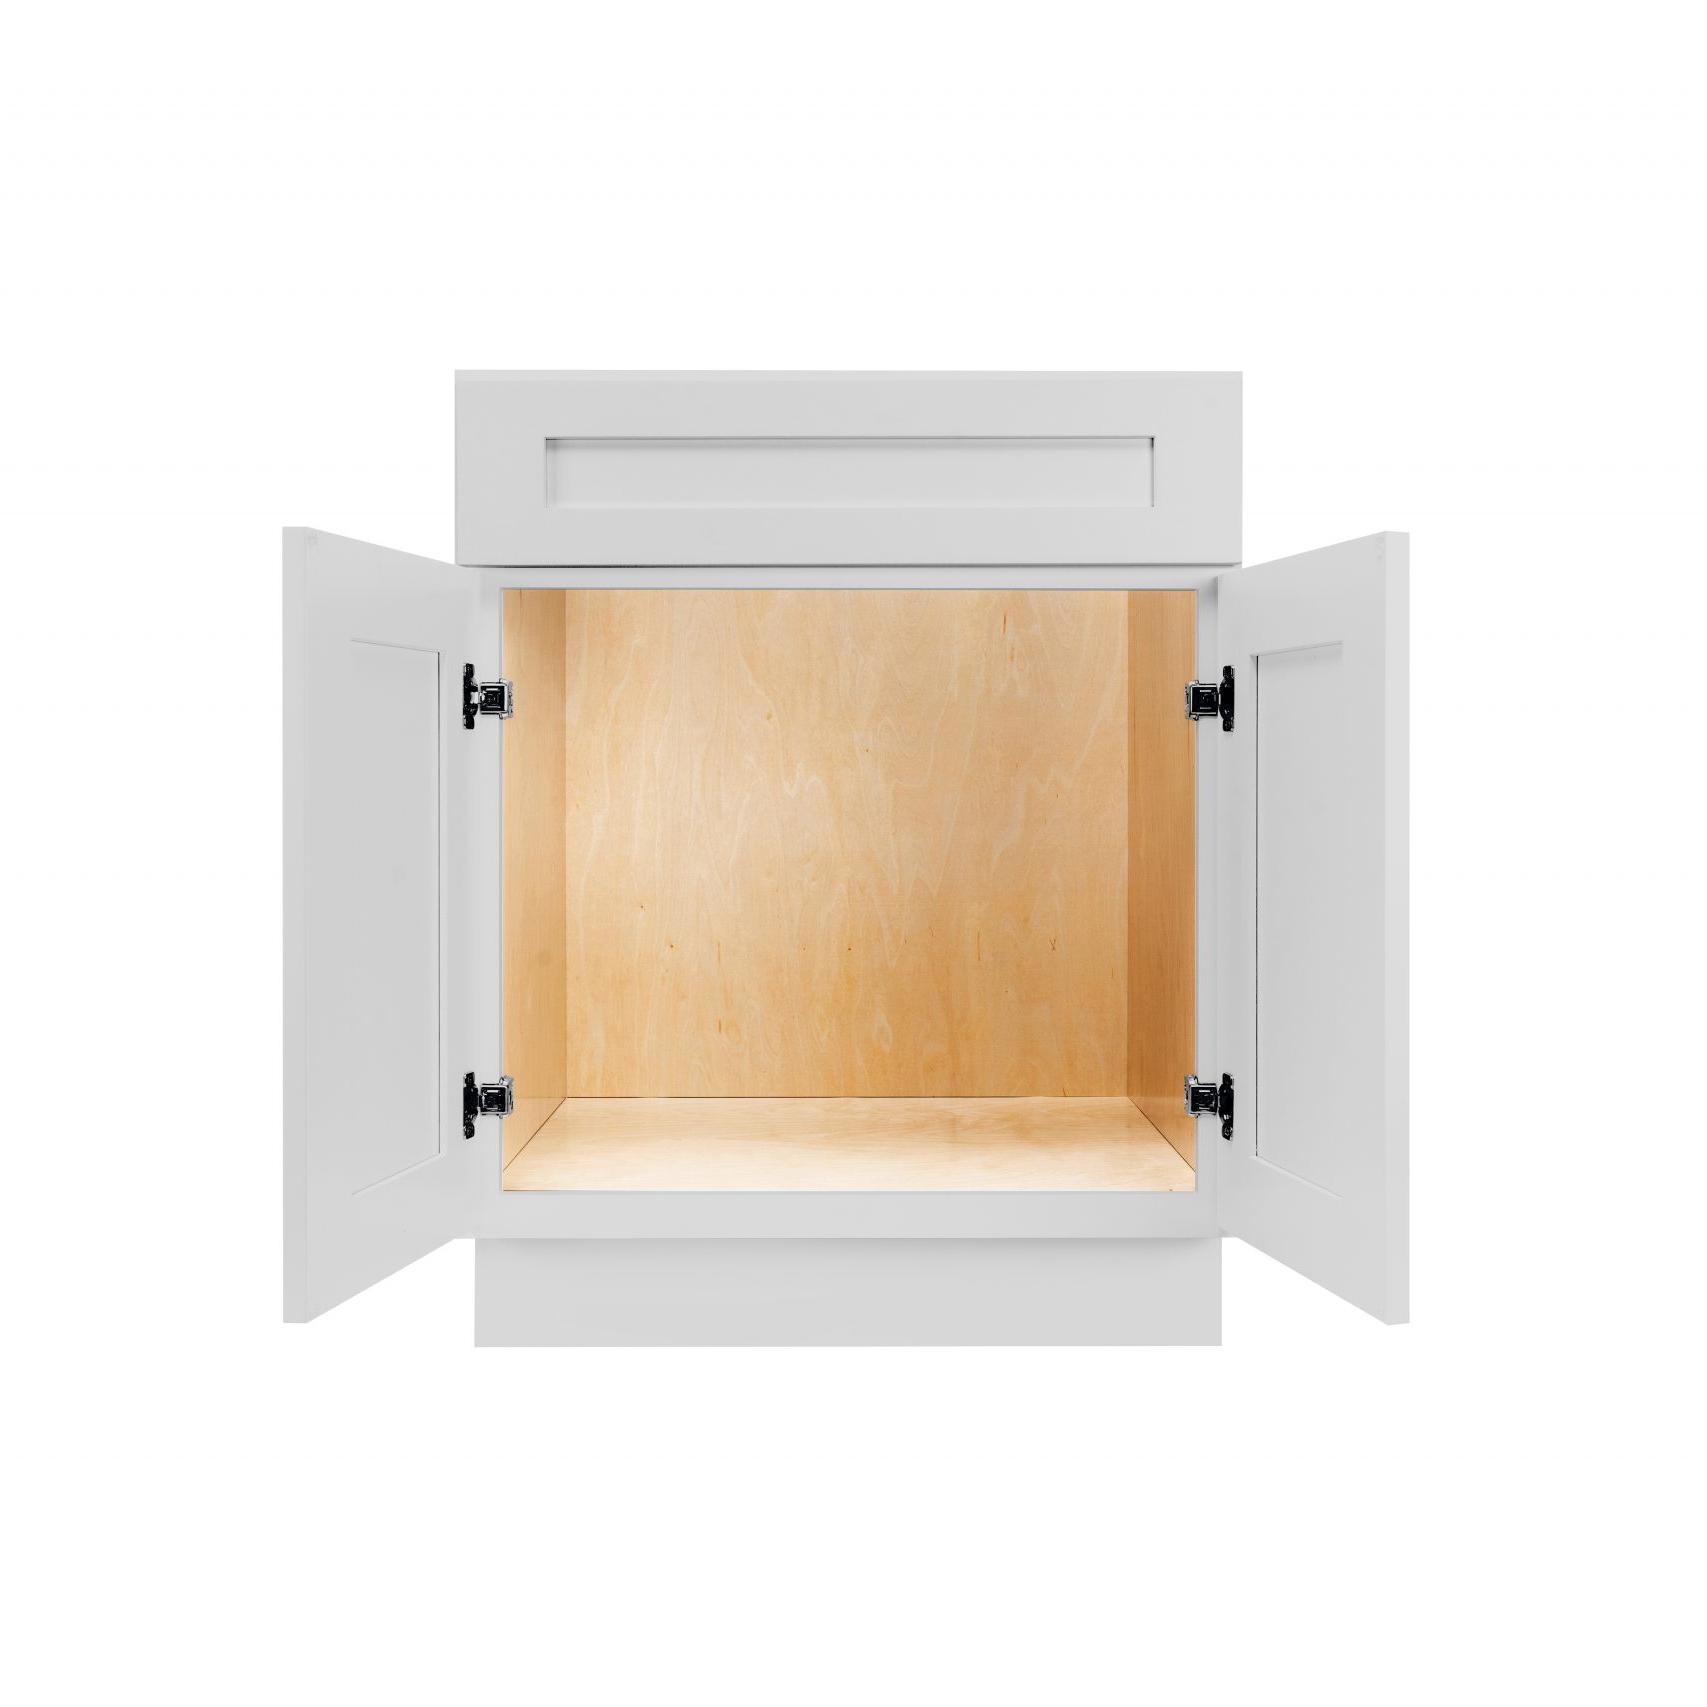 Gray Shaker Cabinetry VA24, VA27, VA30, VA36